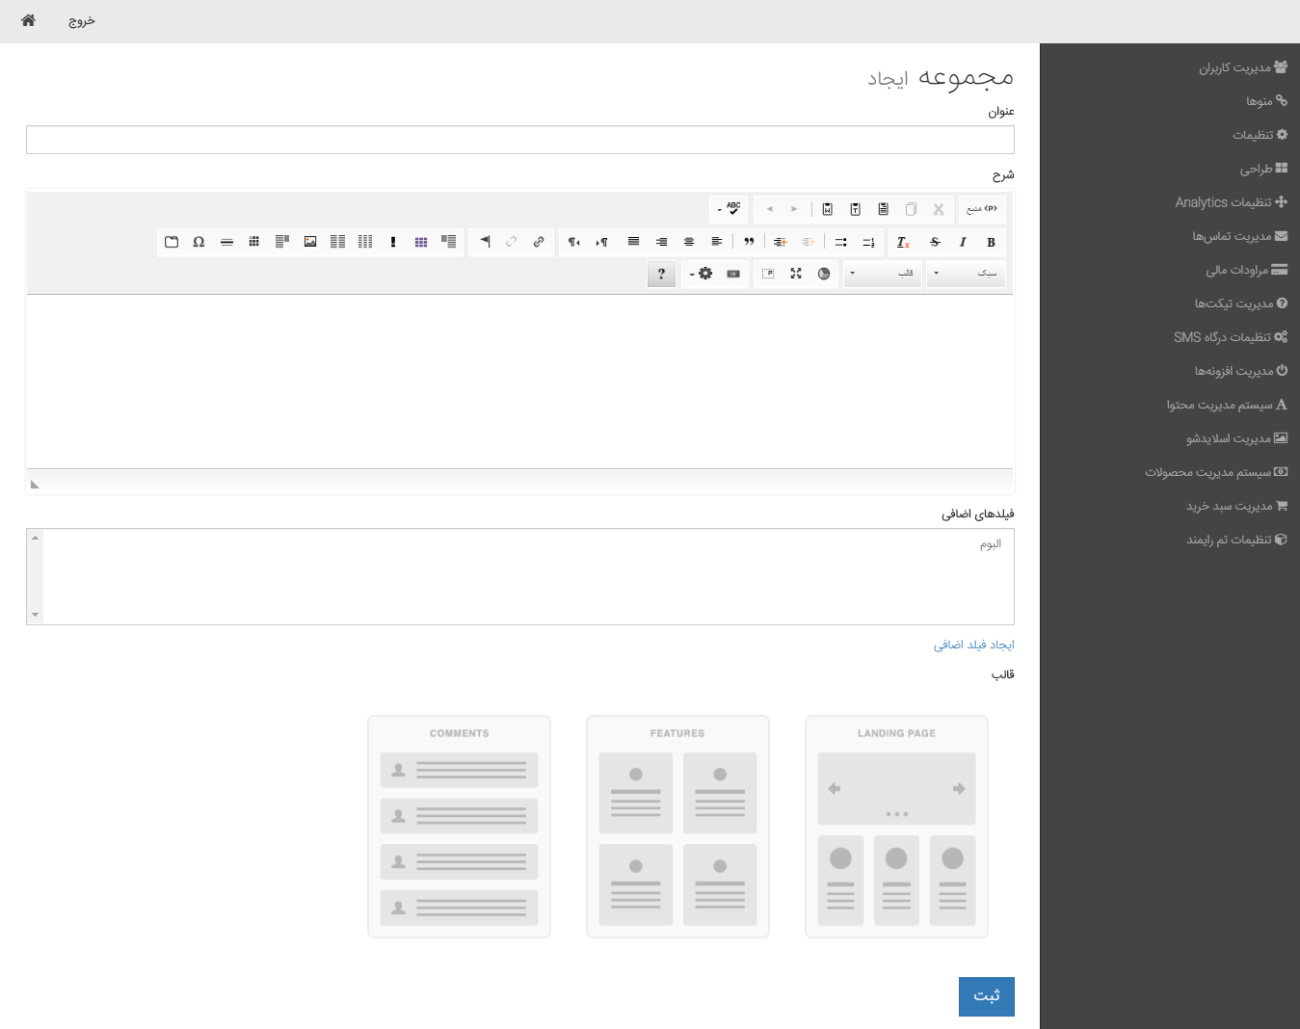 طراحی وبسایت ، سیستم مدیریت محتوا بسته پیشهور